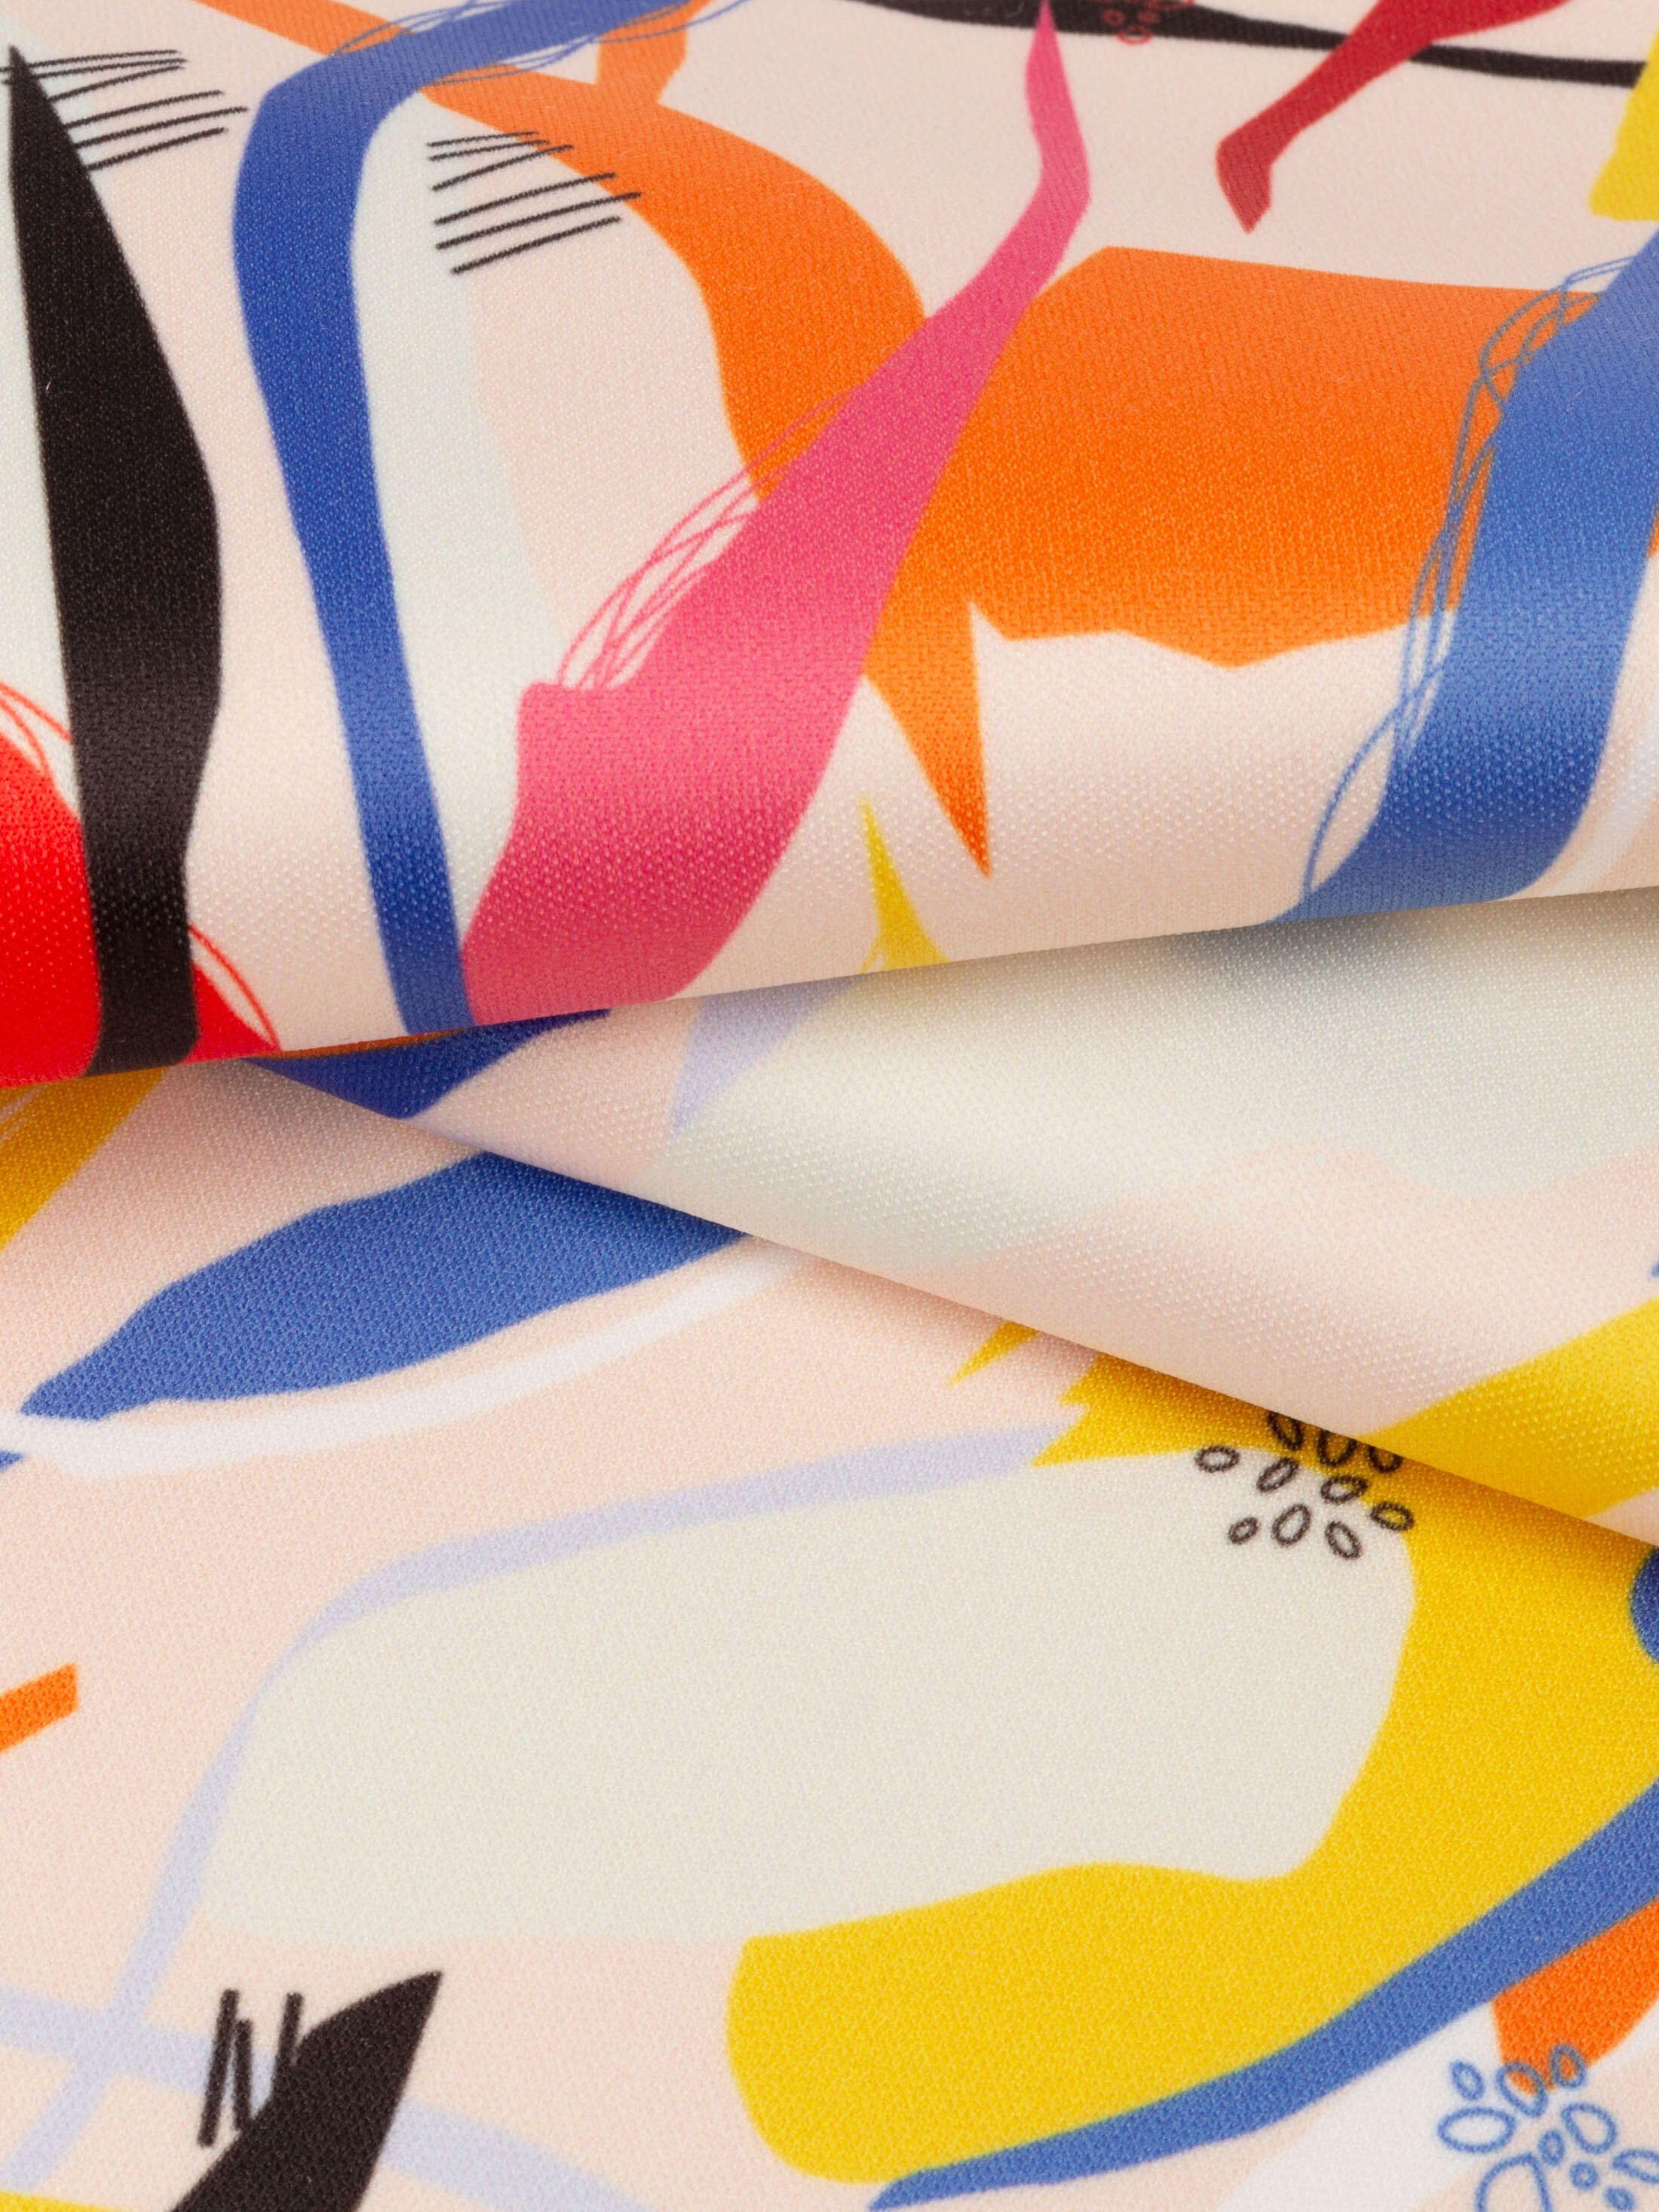 stampa tessile su jersey acetato